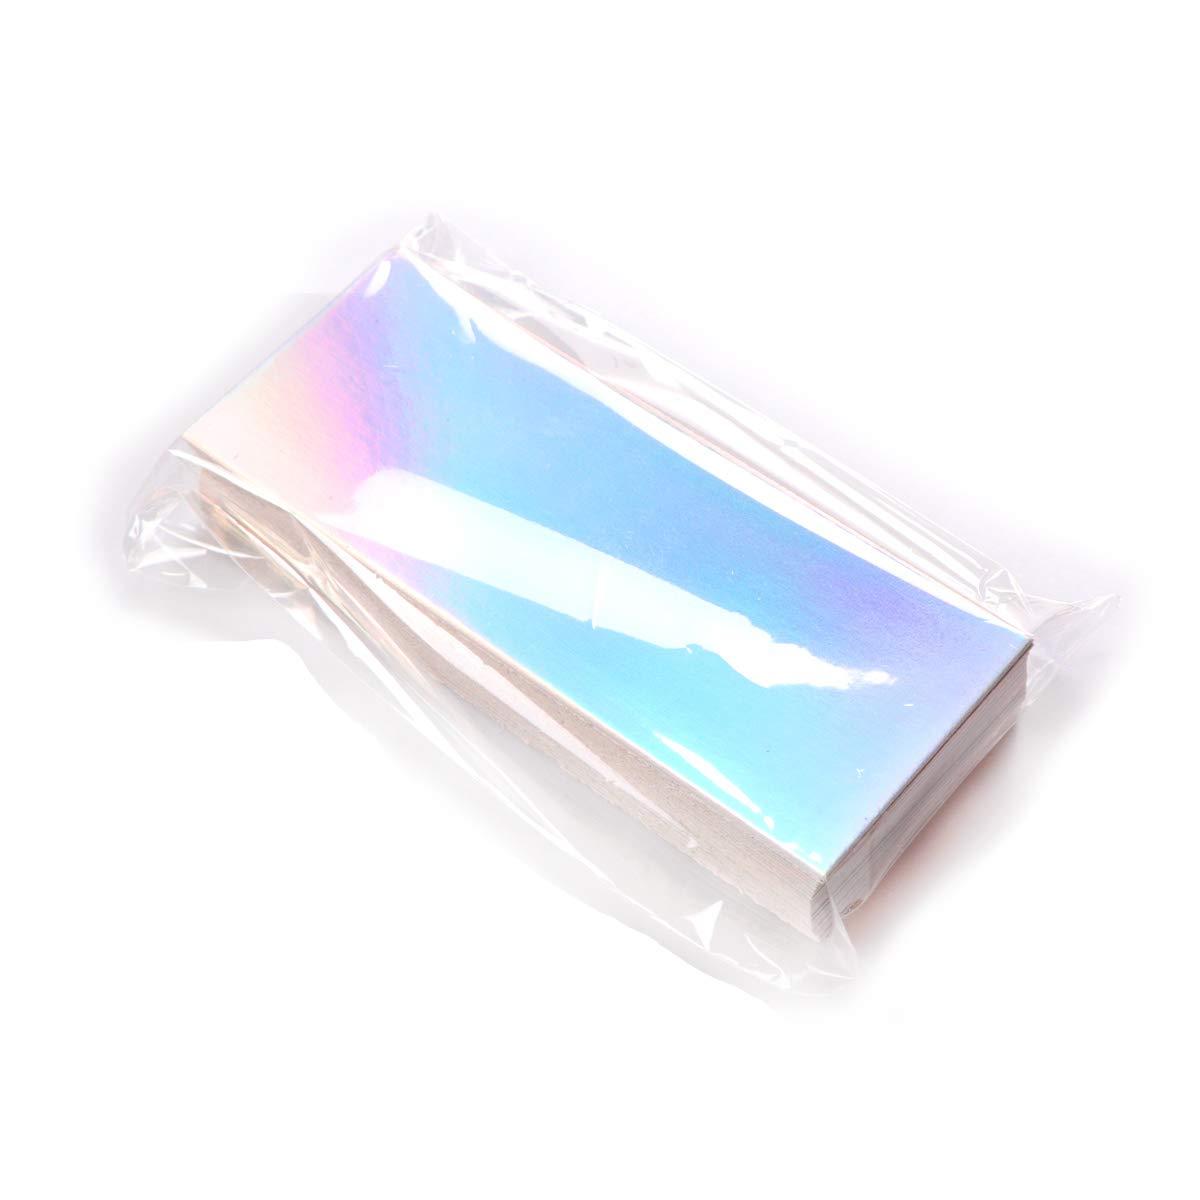 50pcs Holographic Cardboards (4.21x1.65) to be Put Inside Regular Sliding Lash Case